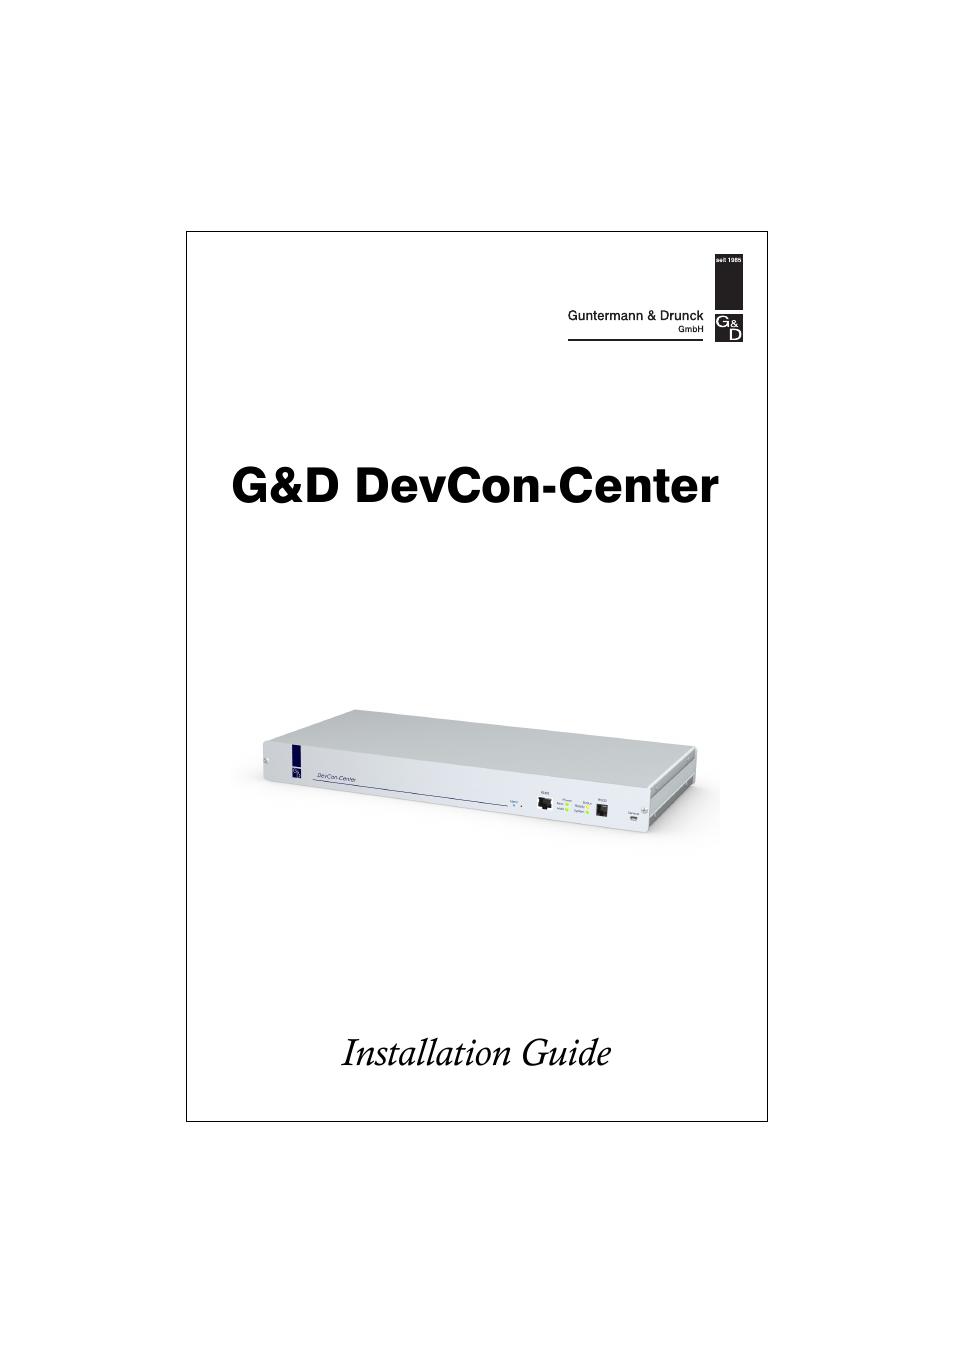 Guntermann & Drunck DevCon-Center Installation User Manual